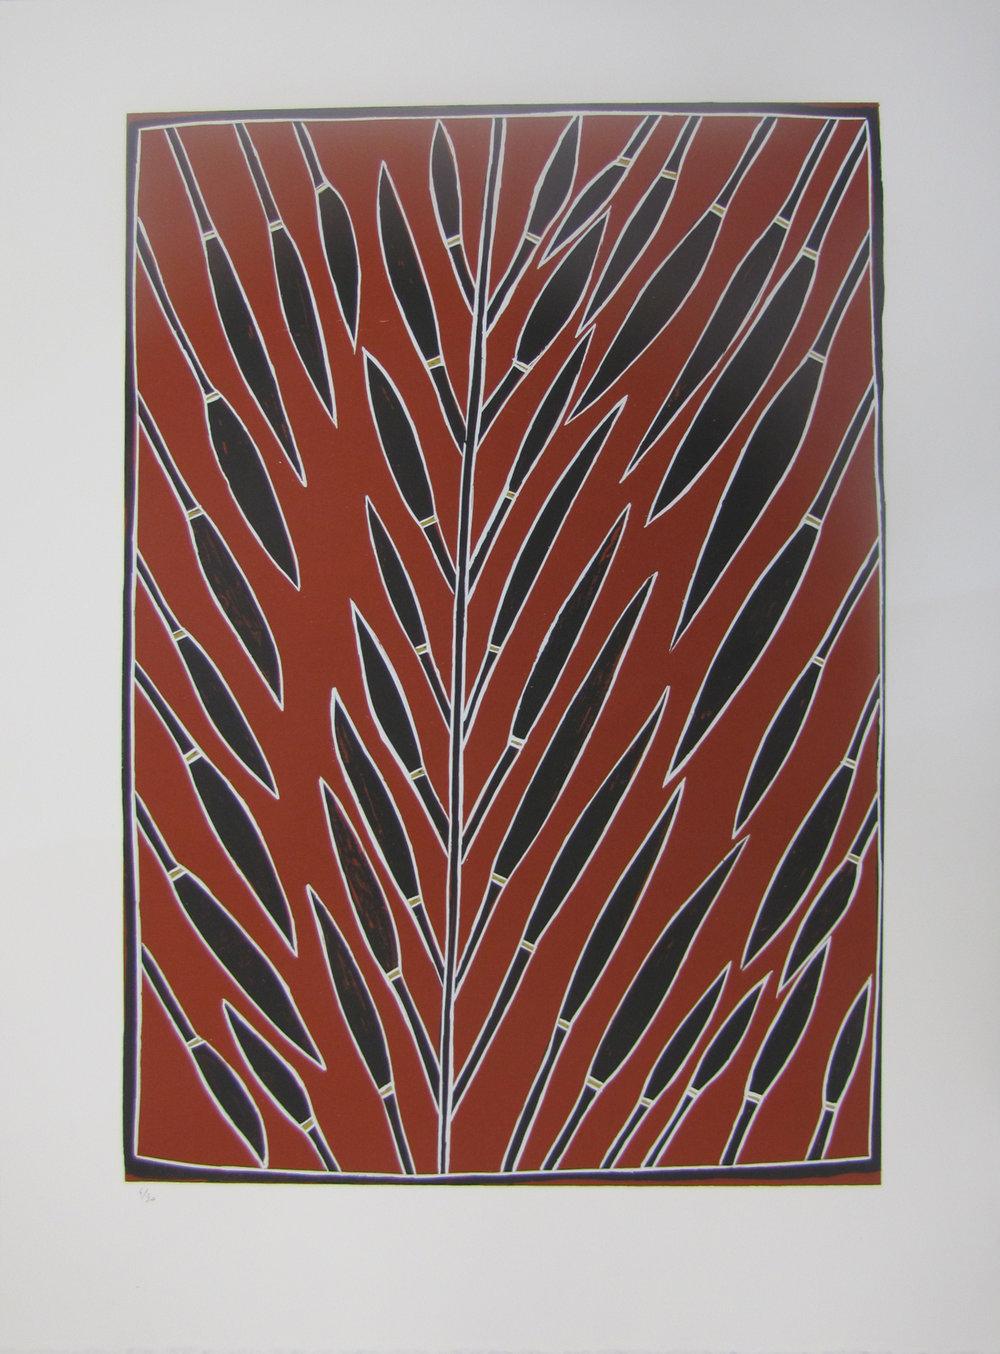 Peter Mingululu, Stringy Bark Tree. 2016  Silkscreen. Ed 5 /30 59.5 x 42 cm $350 (unframed)  $550 (framed)   Editions 6/30, 7/30 & 8/30 (unframed) also available